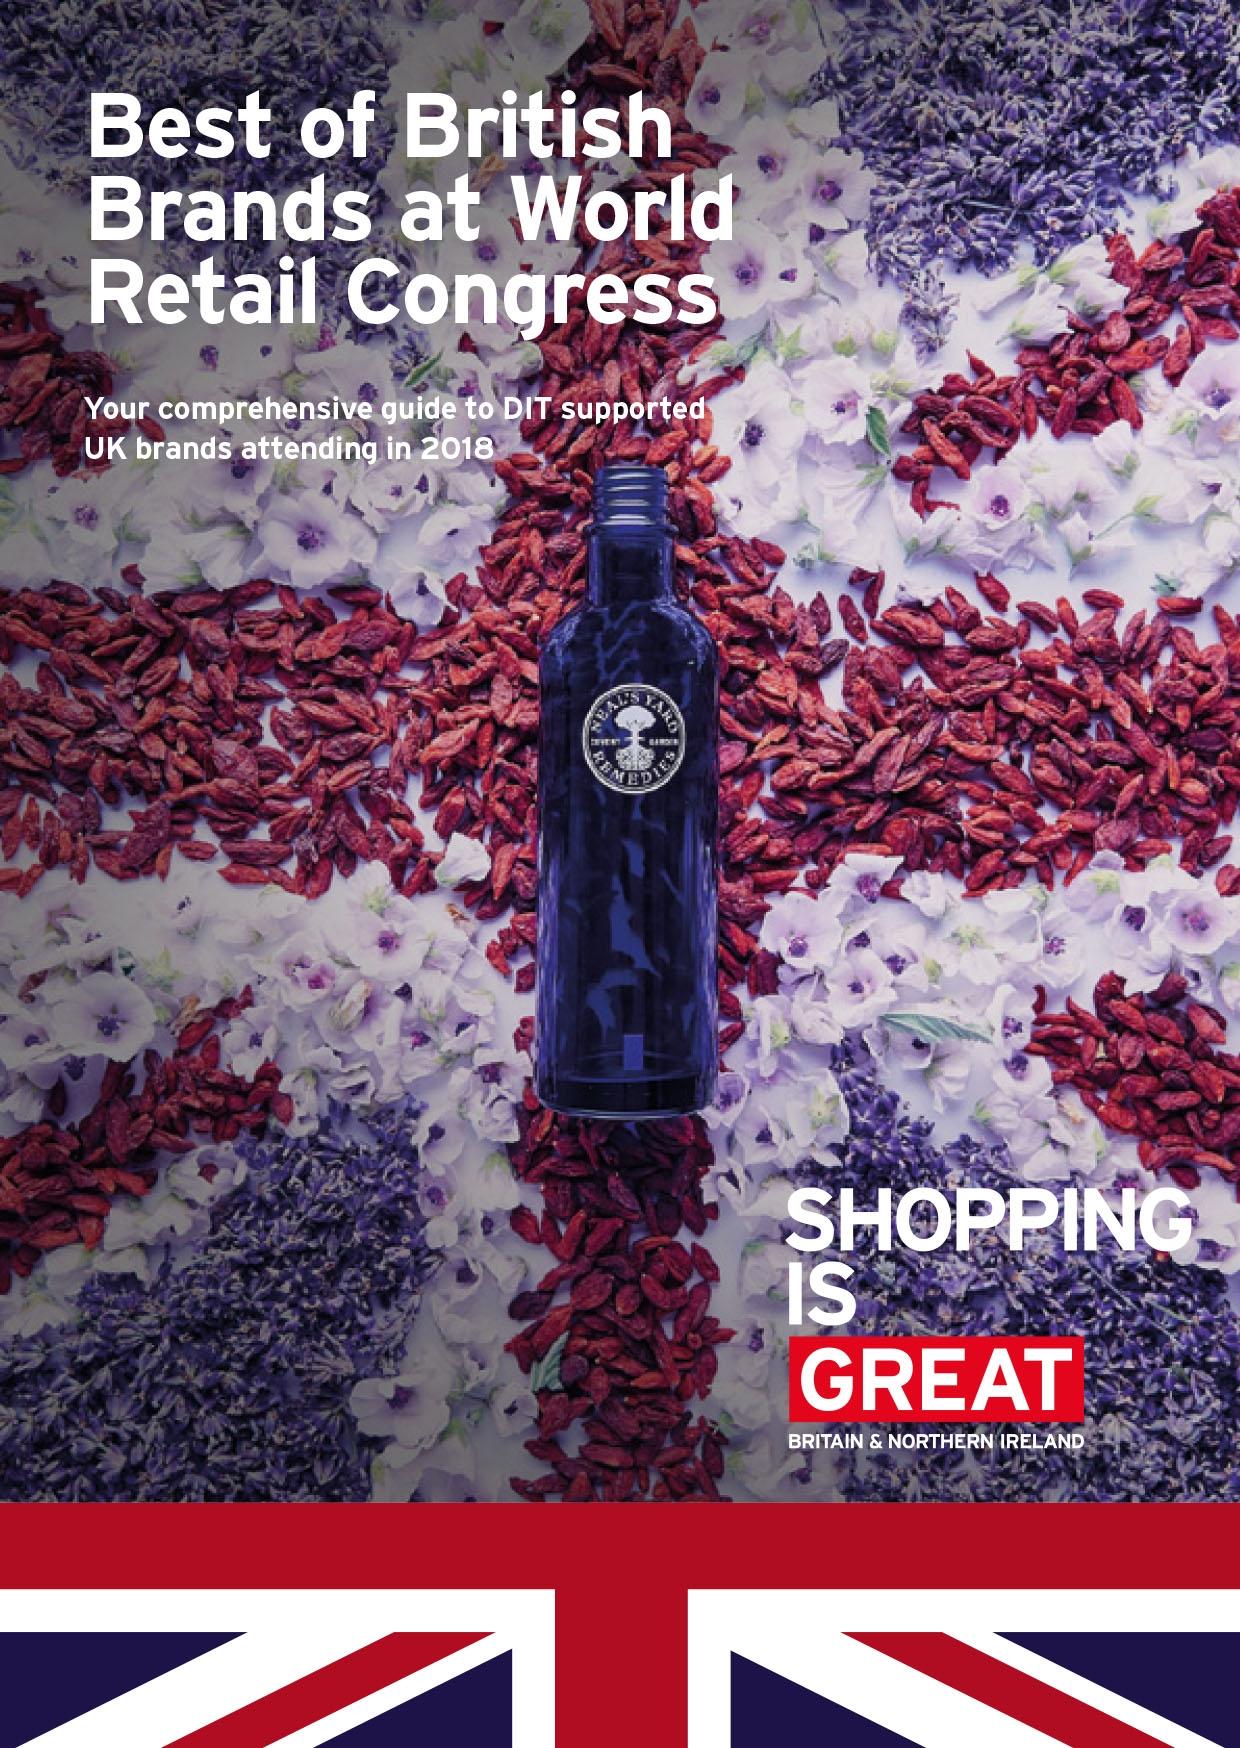 April 2018 Best of British Brands